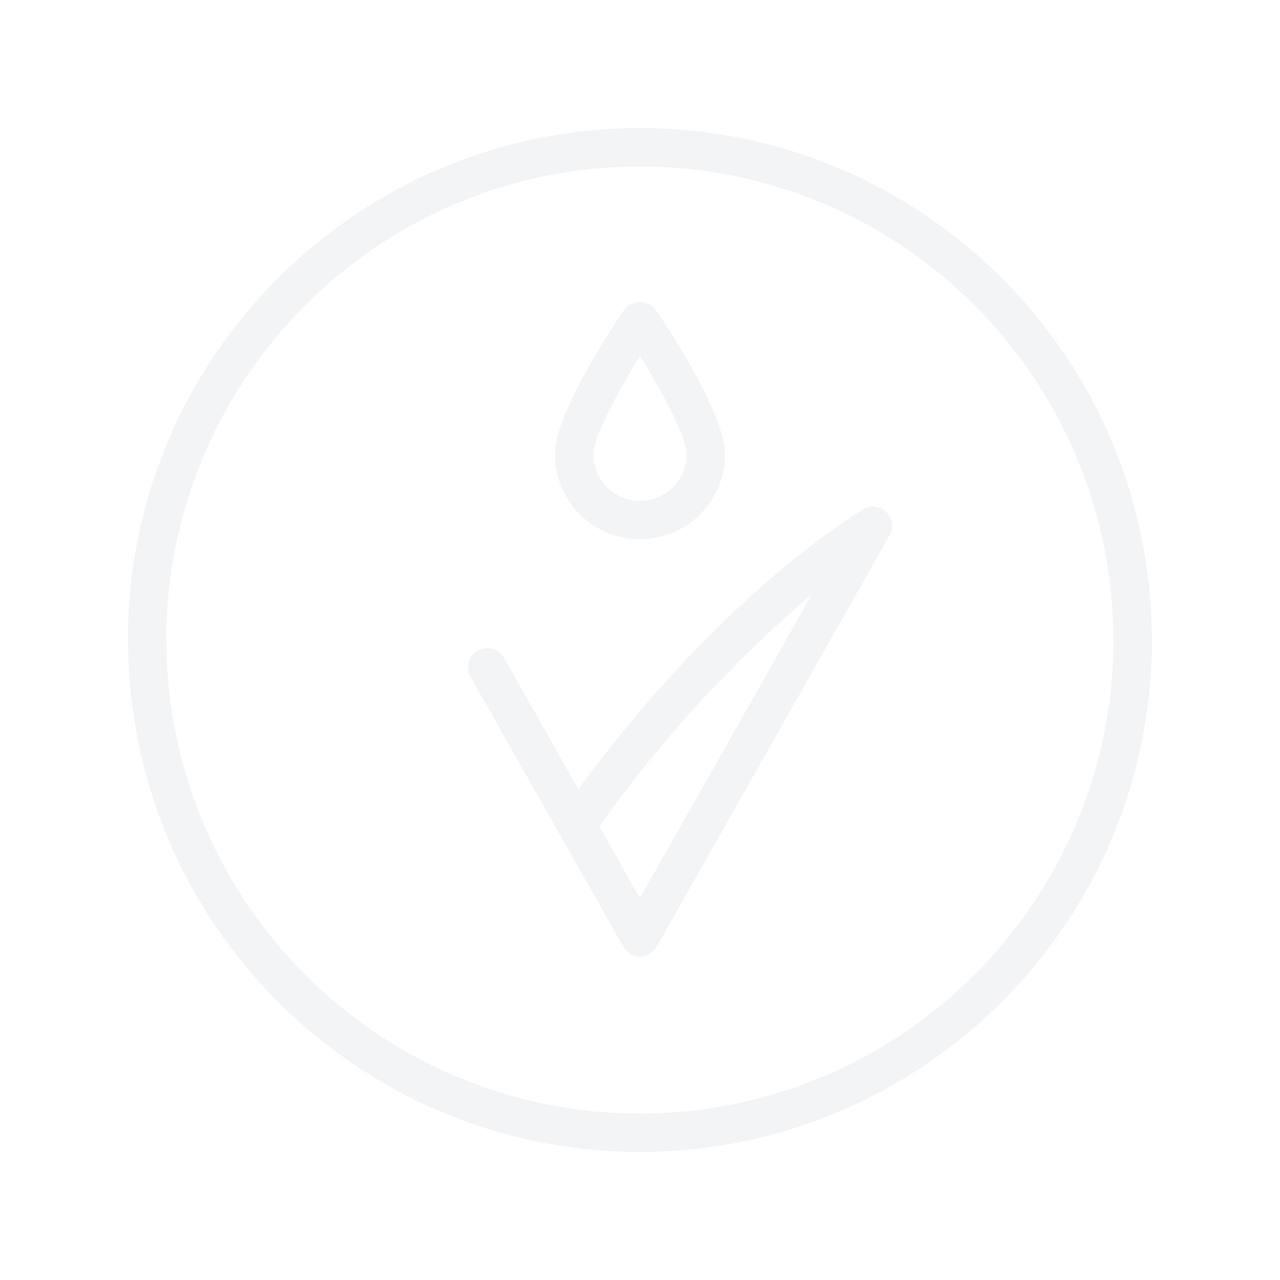 MARC JACOBS Decadence 50ml Eau De Parfum komplekt